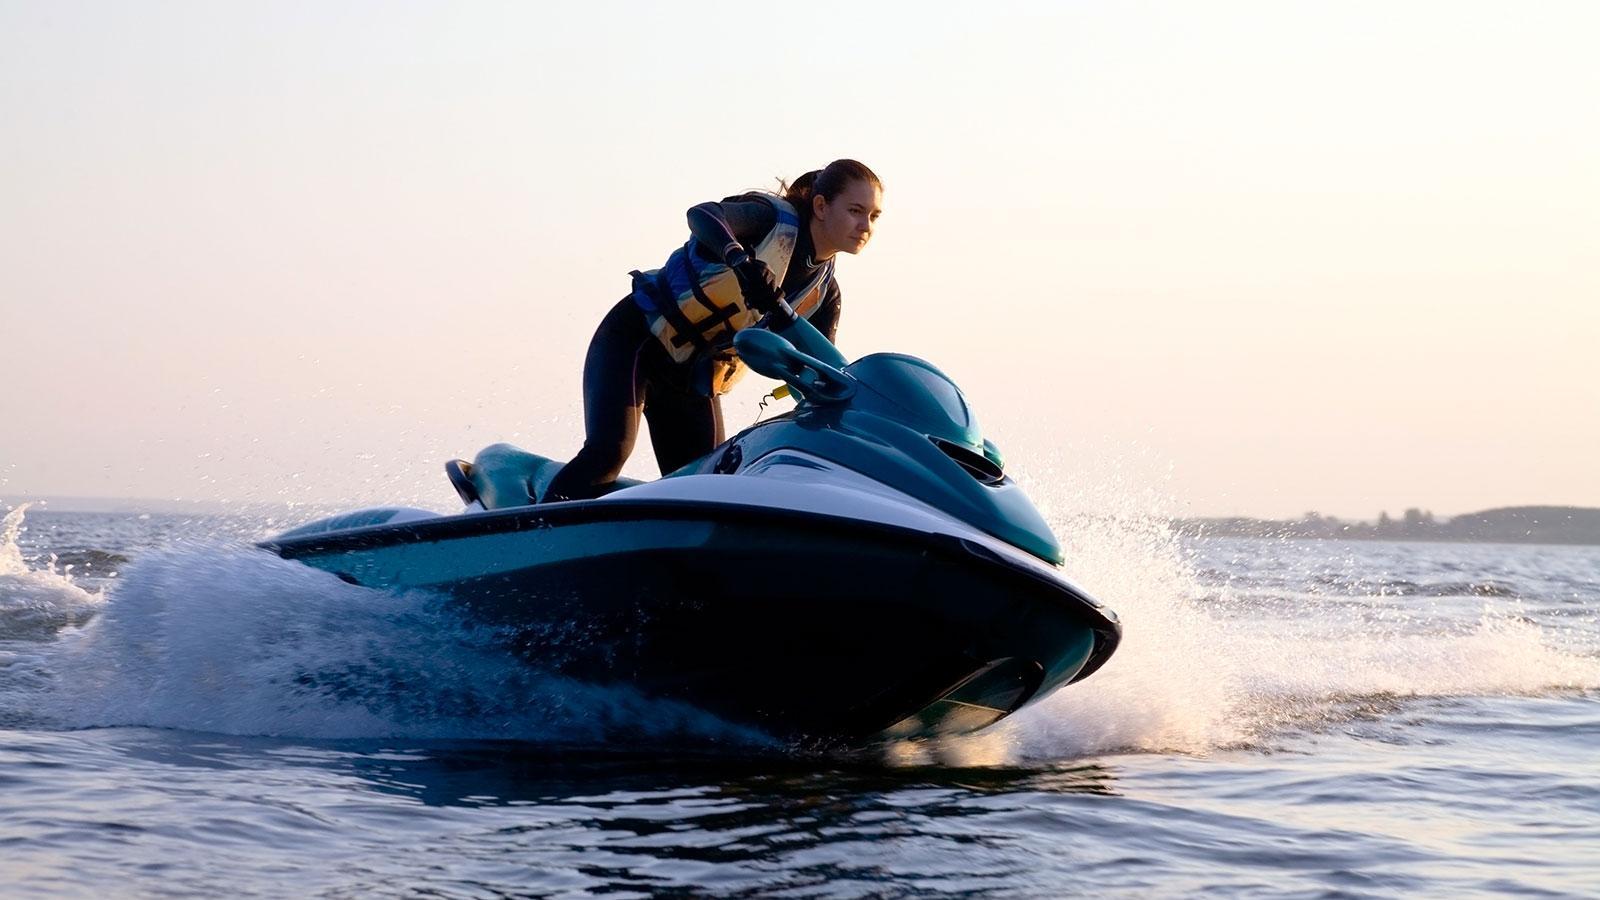 woman-on-jet-ski